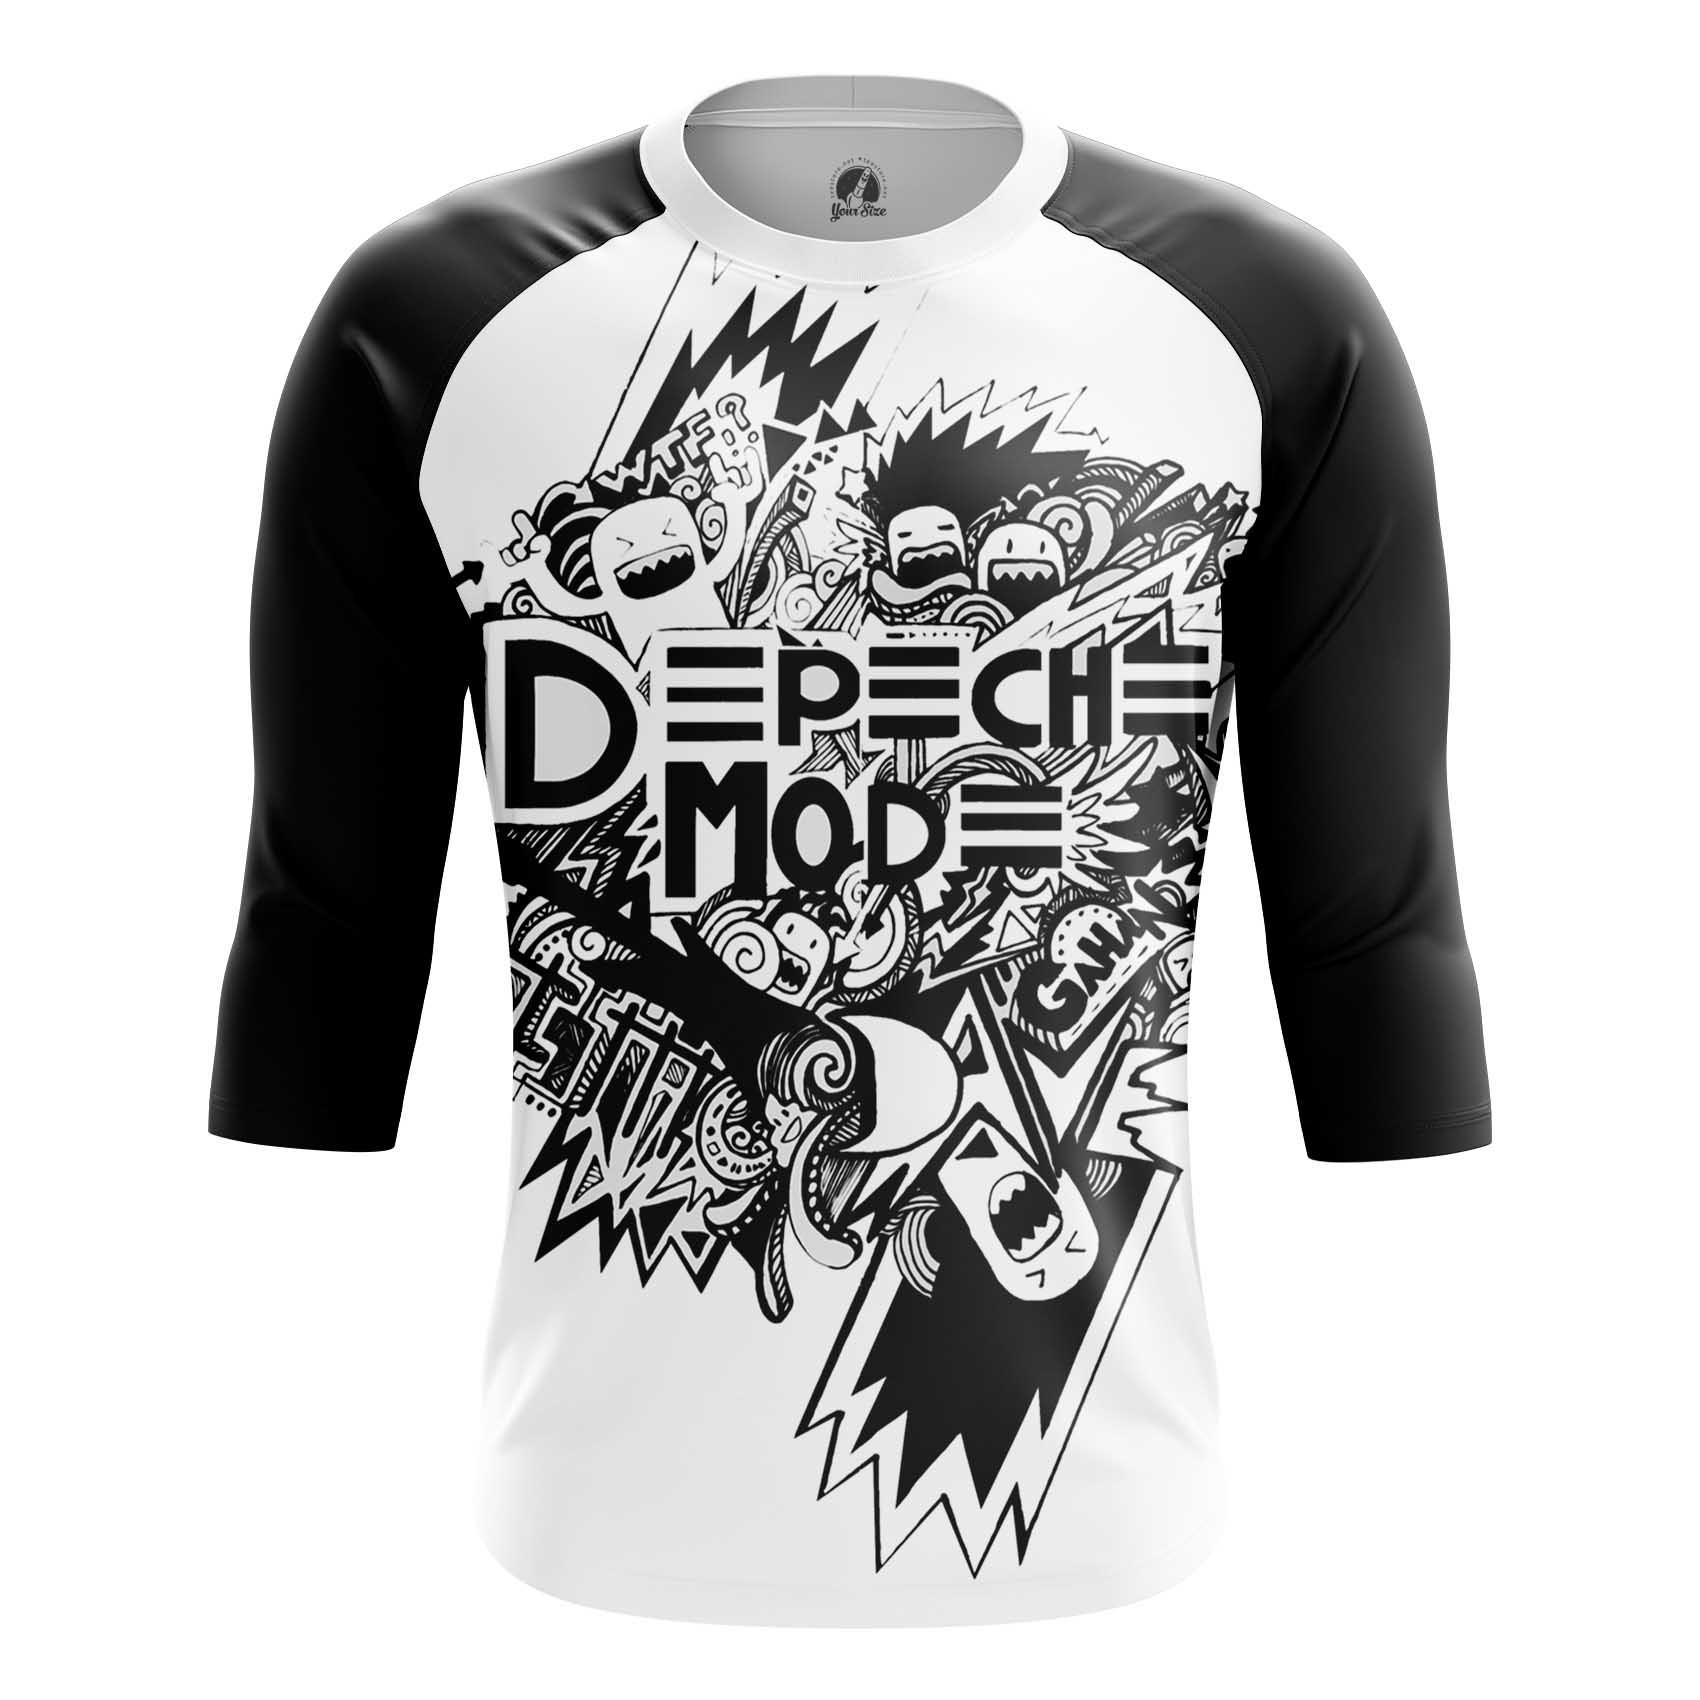 Merchandise Men'S T-Shirt Depeche Modeandise Black And White